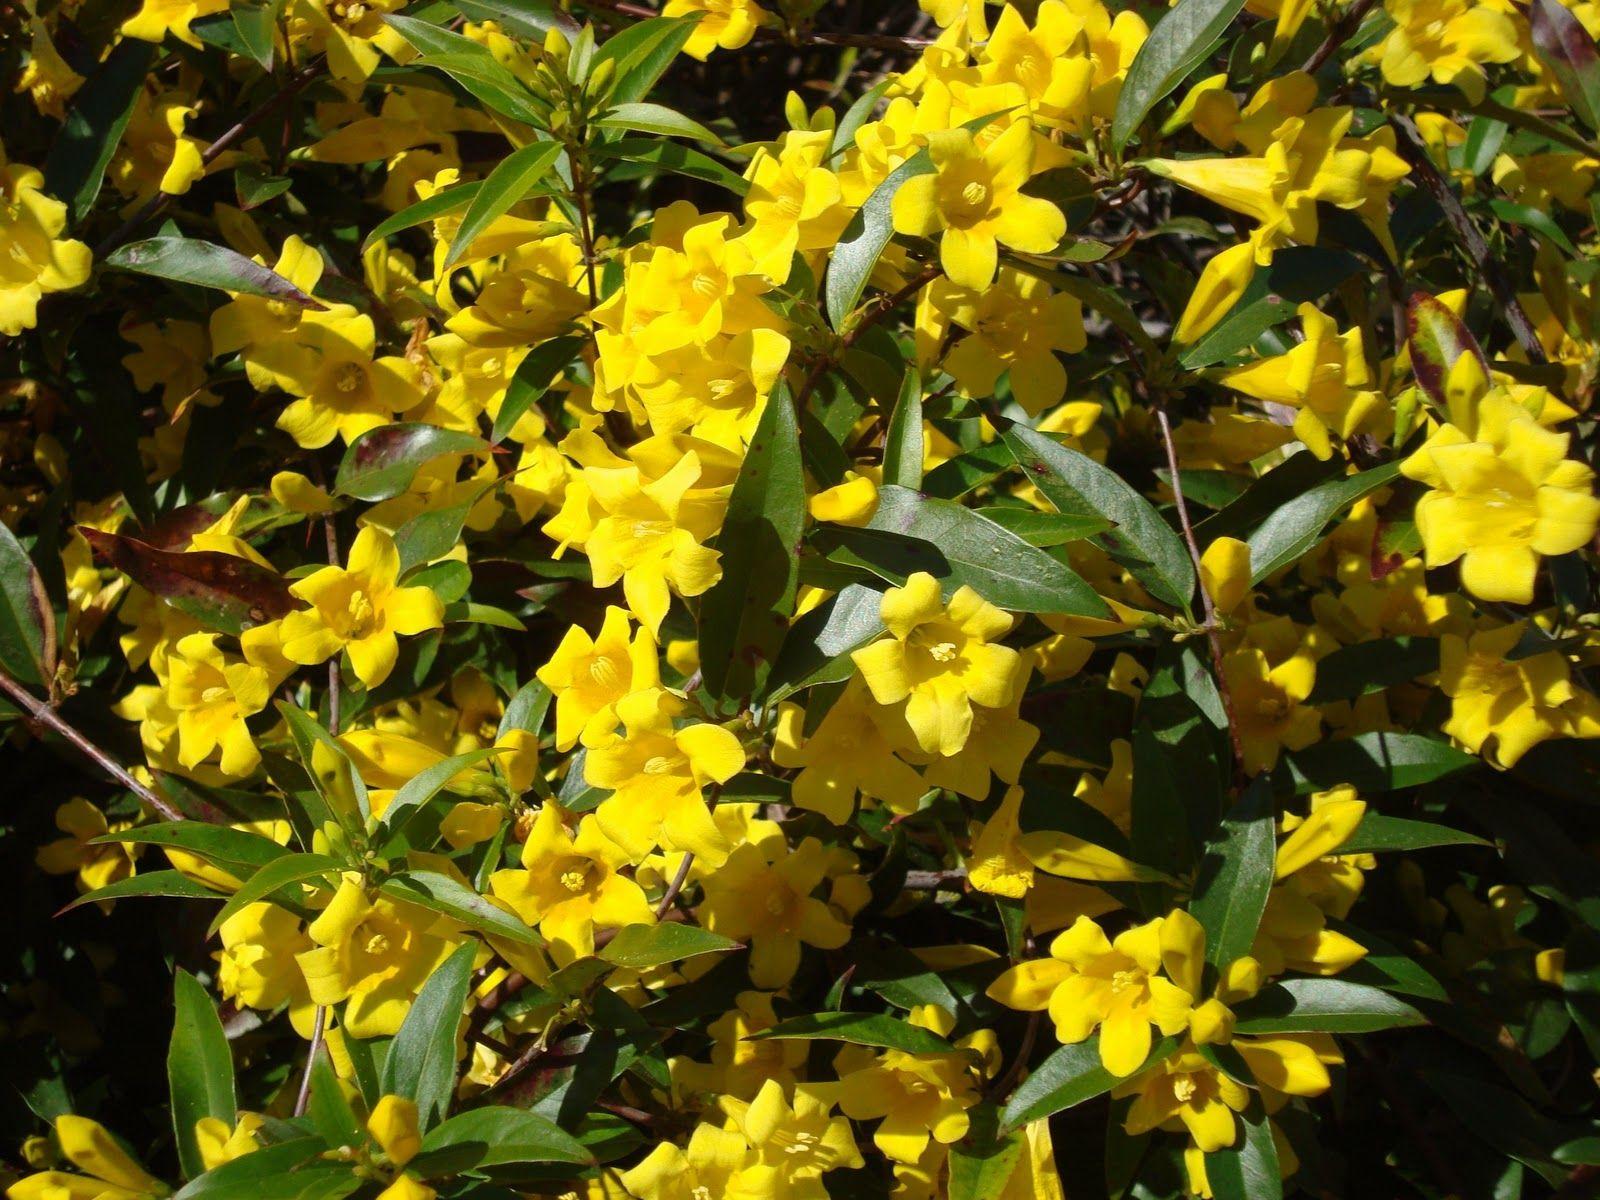 Gelsemium Sempervirens Flowers Caroline Yellow Jasmine Fragrant